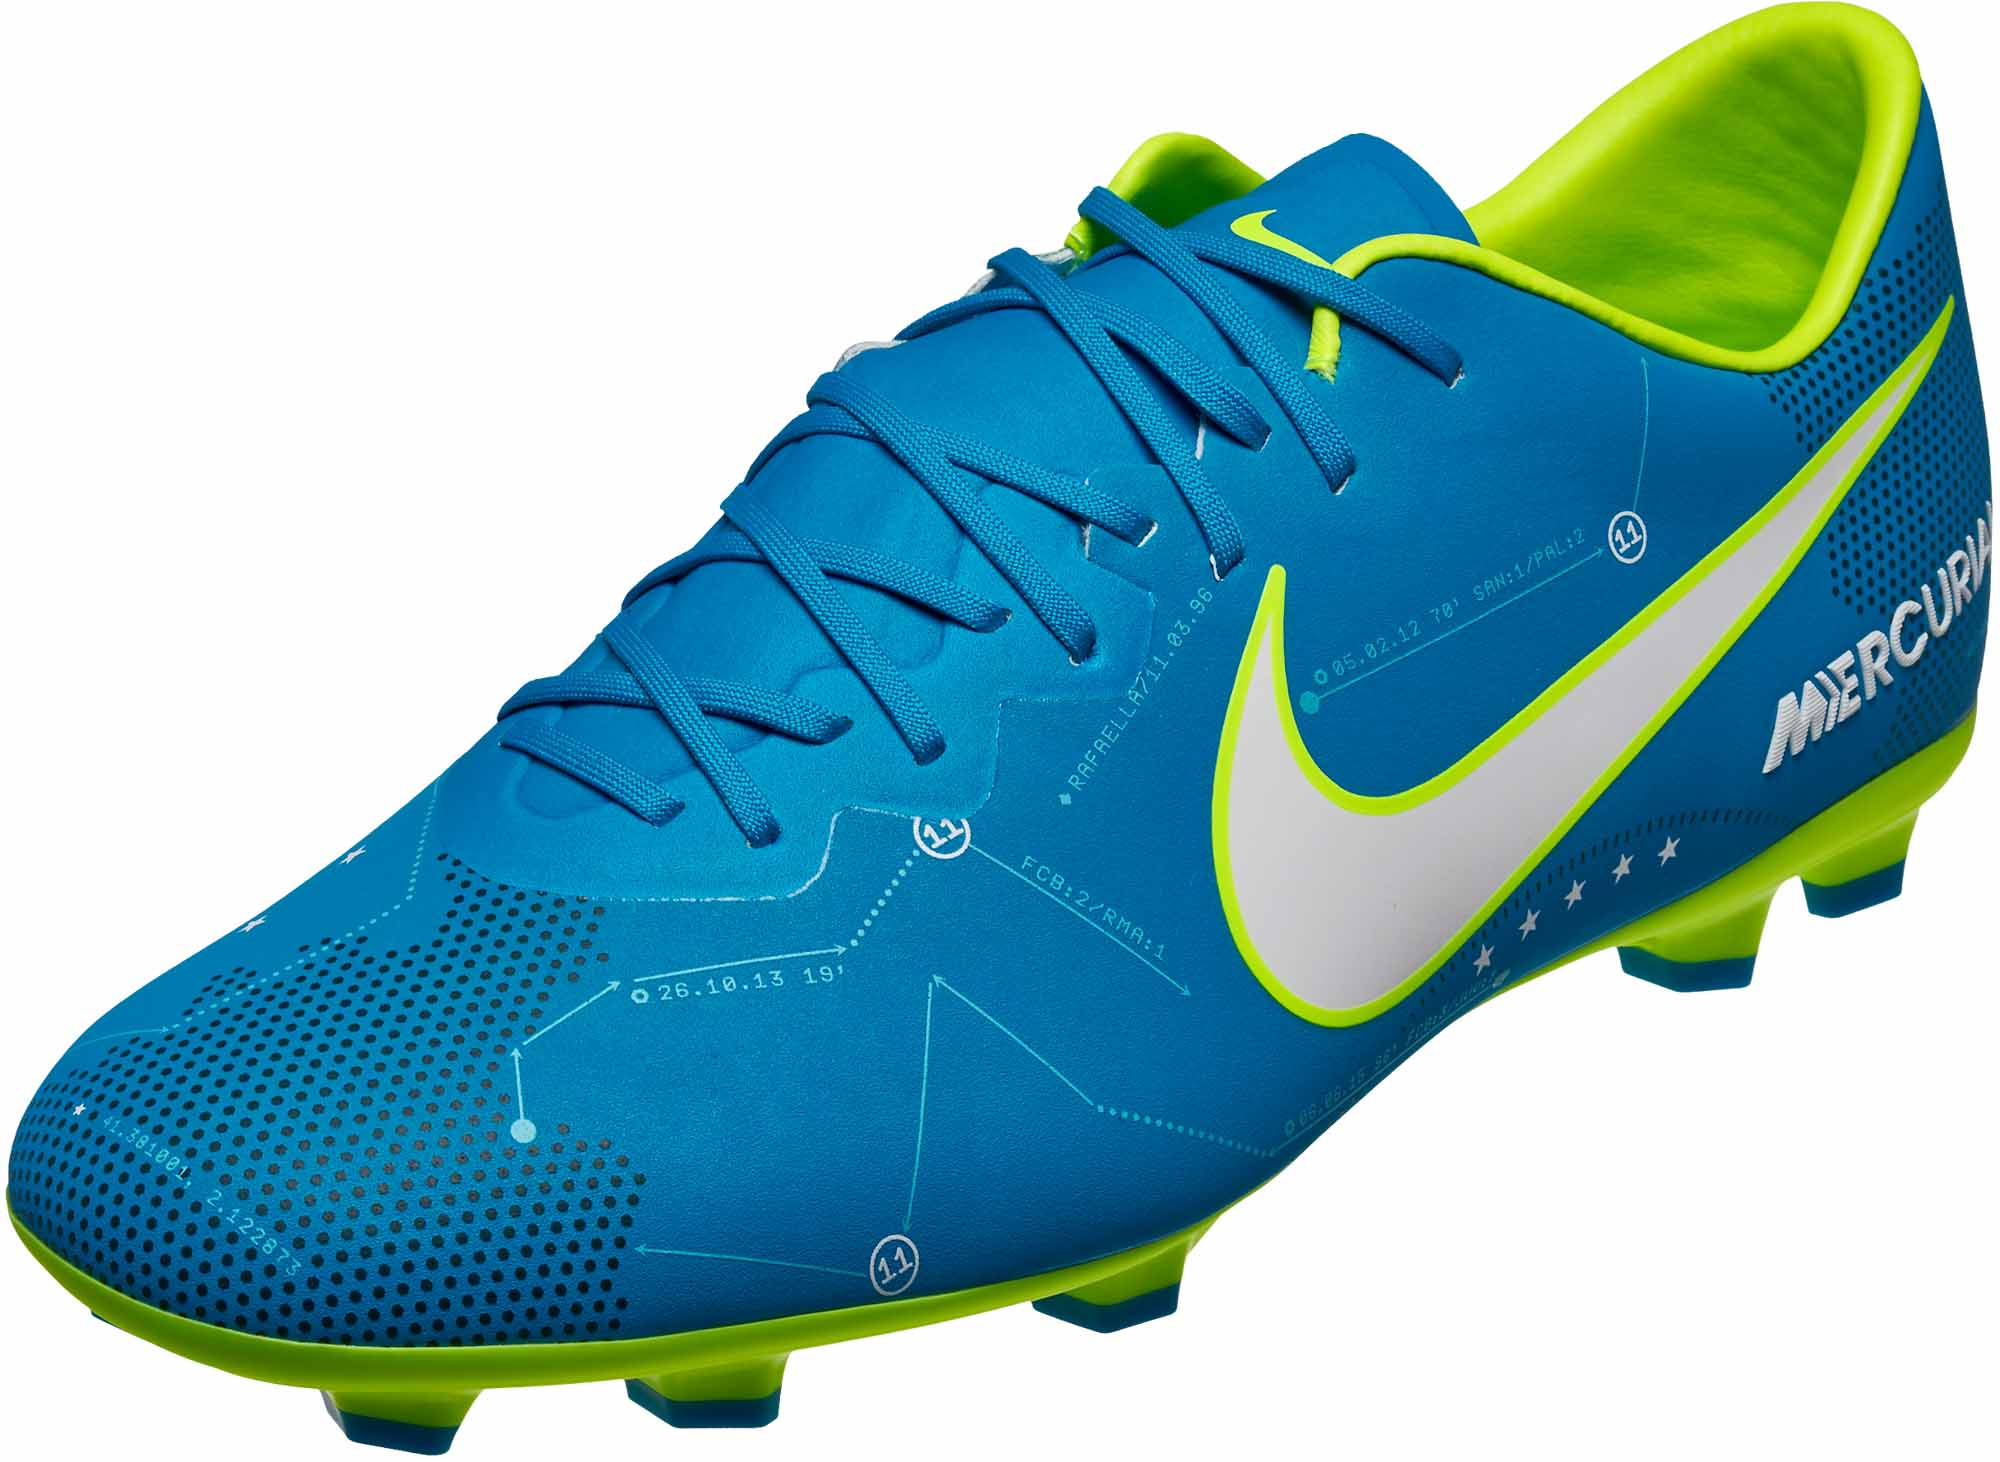 e3e391469951 nike kids mercurial vapor xi sx fg soccer cleats – neymar – blue. Download  Image 2000 X 1462